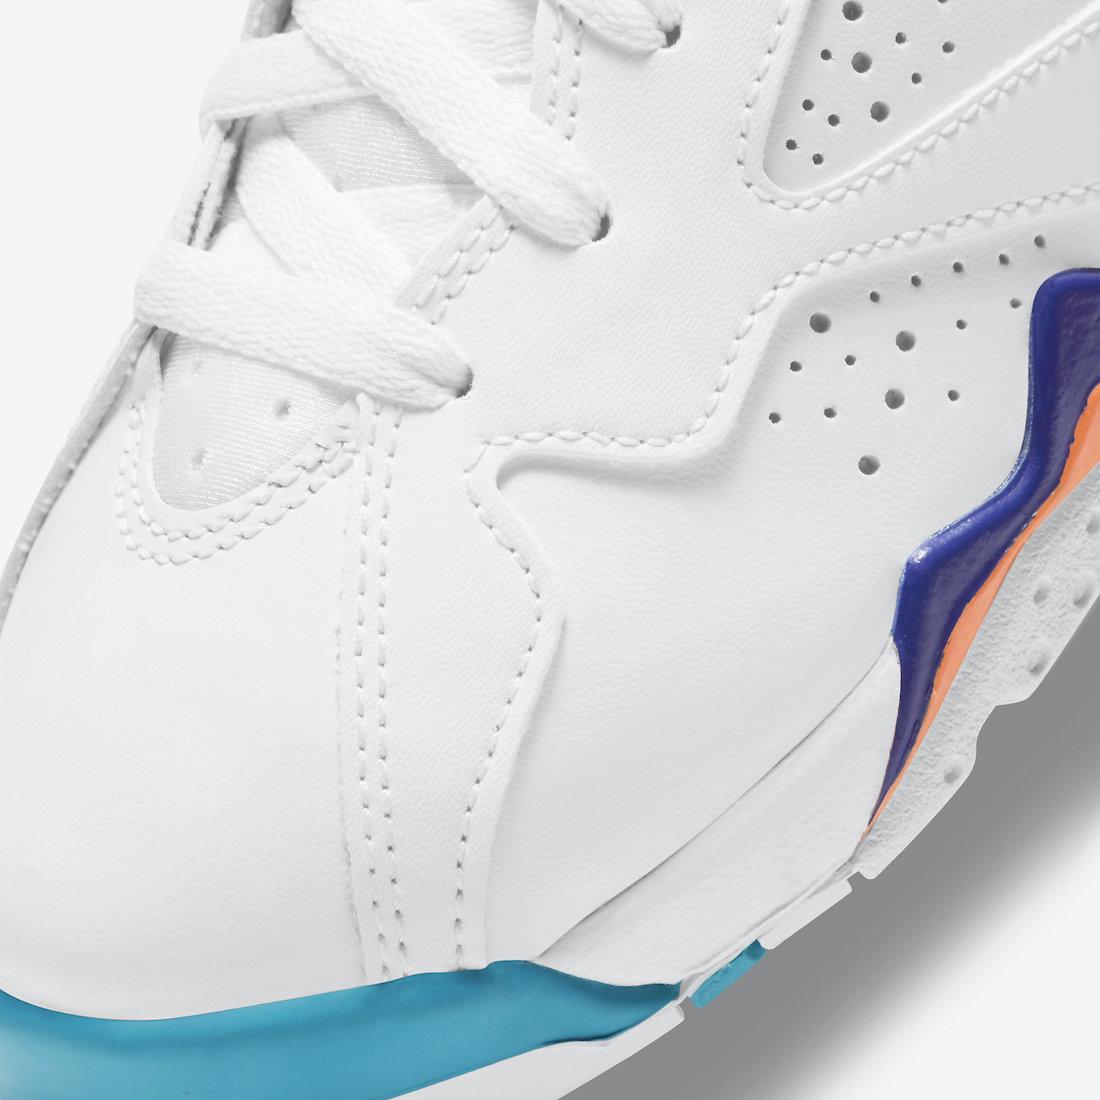 Air Jordan 7 GS White Chlorine Blue 442960-100 Release Date Info